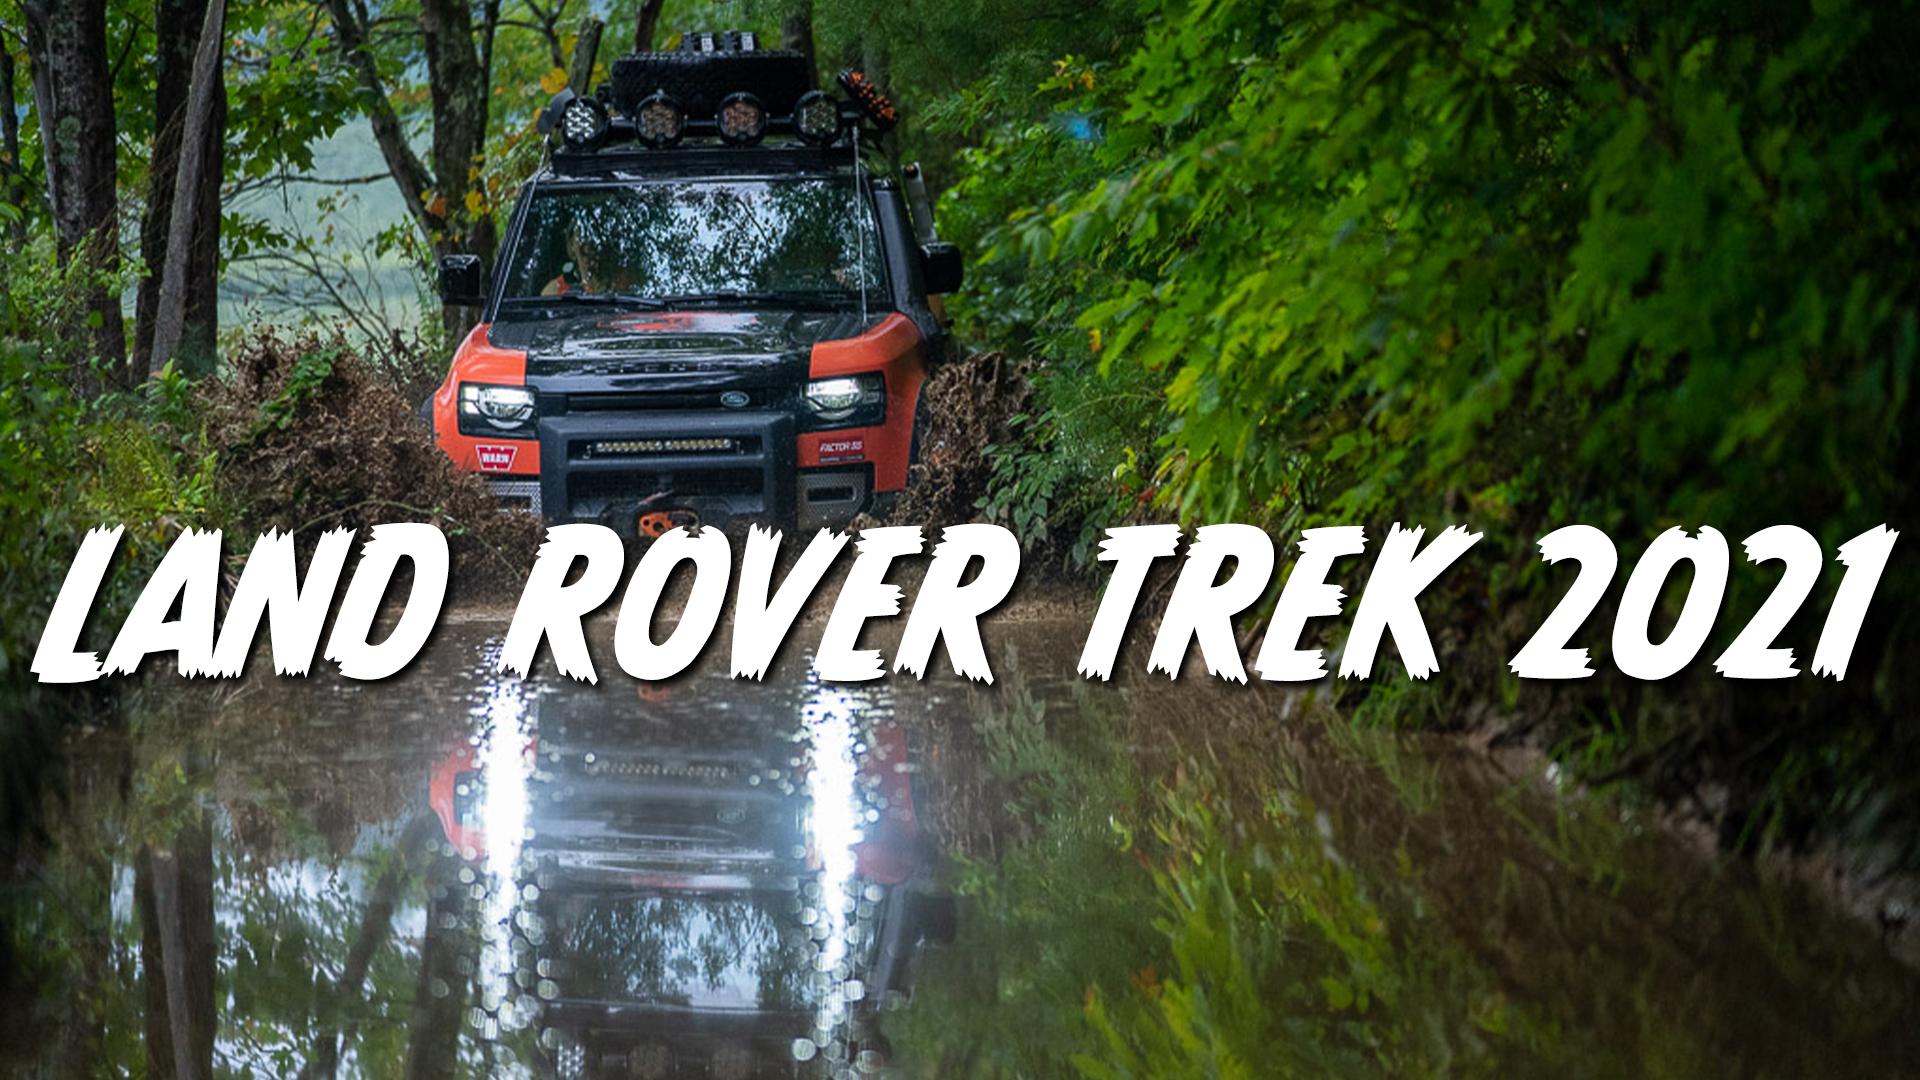 land rover trek 2021